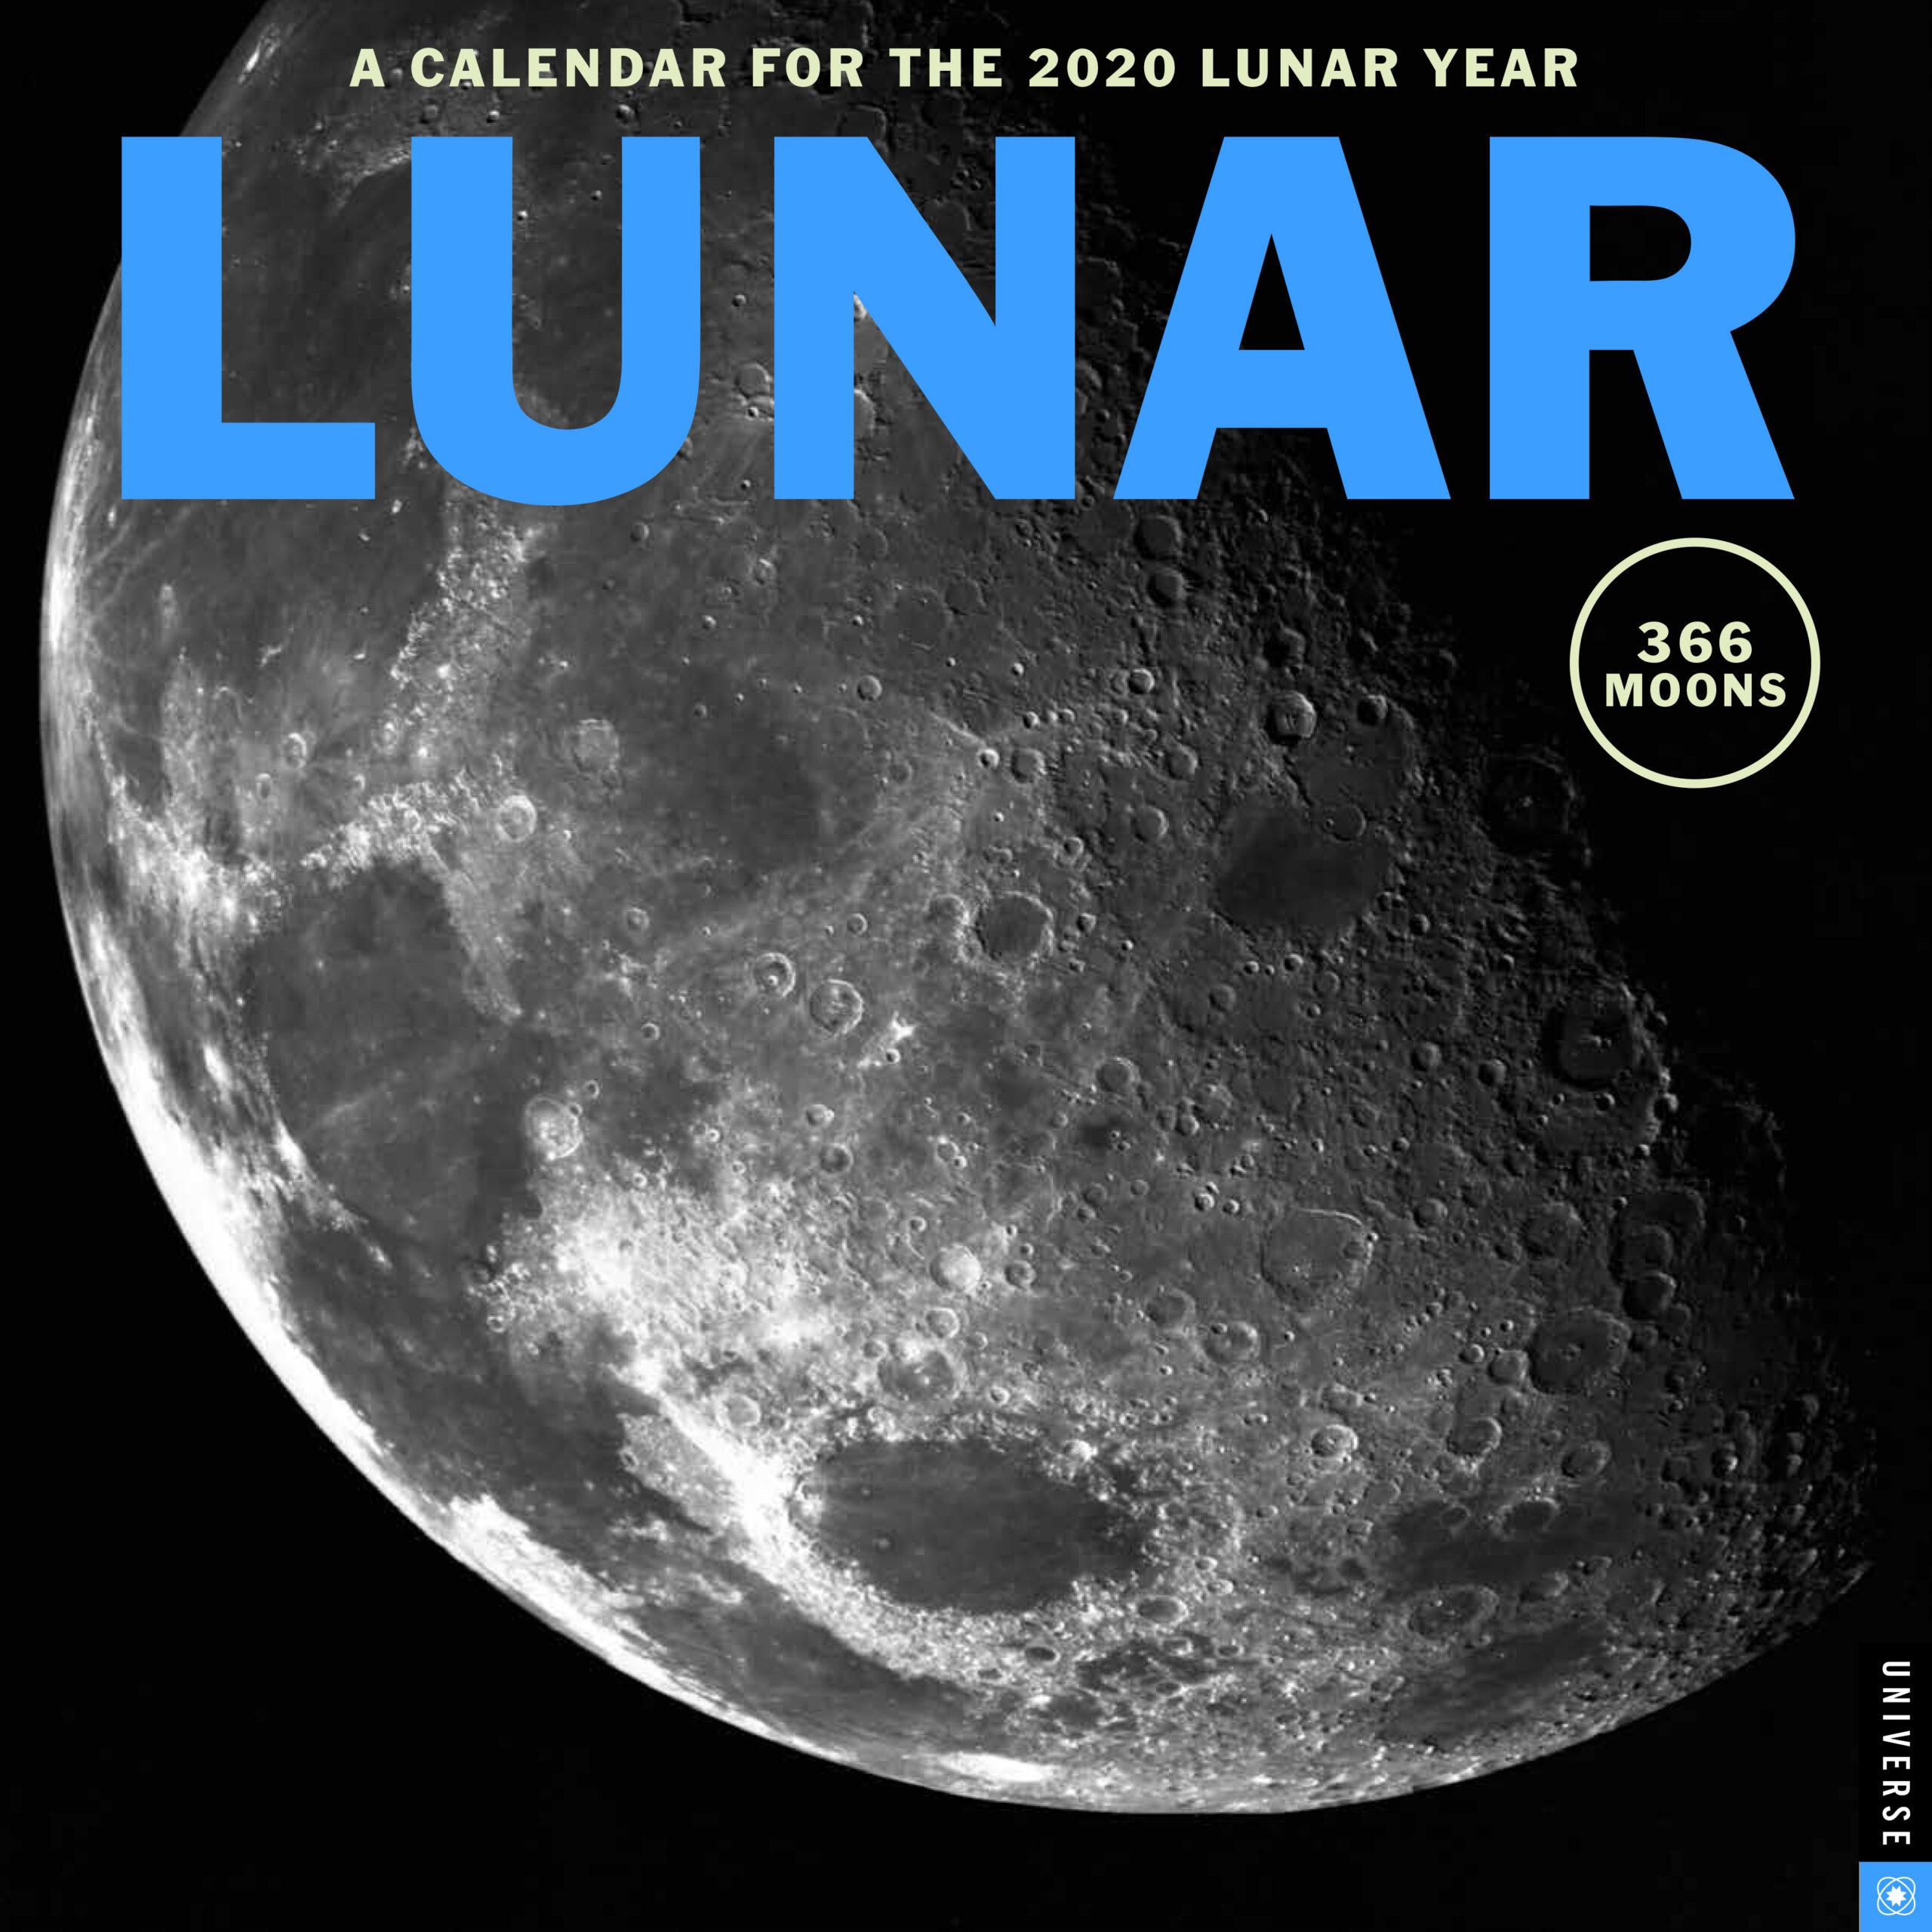 Lunar 2020 Wall Calendar  Walmart  Walmart inside Lunar Hair Cutting Chart 2021 Morrocco